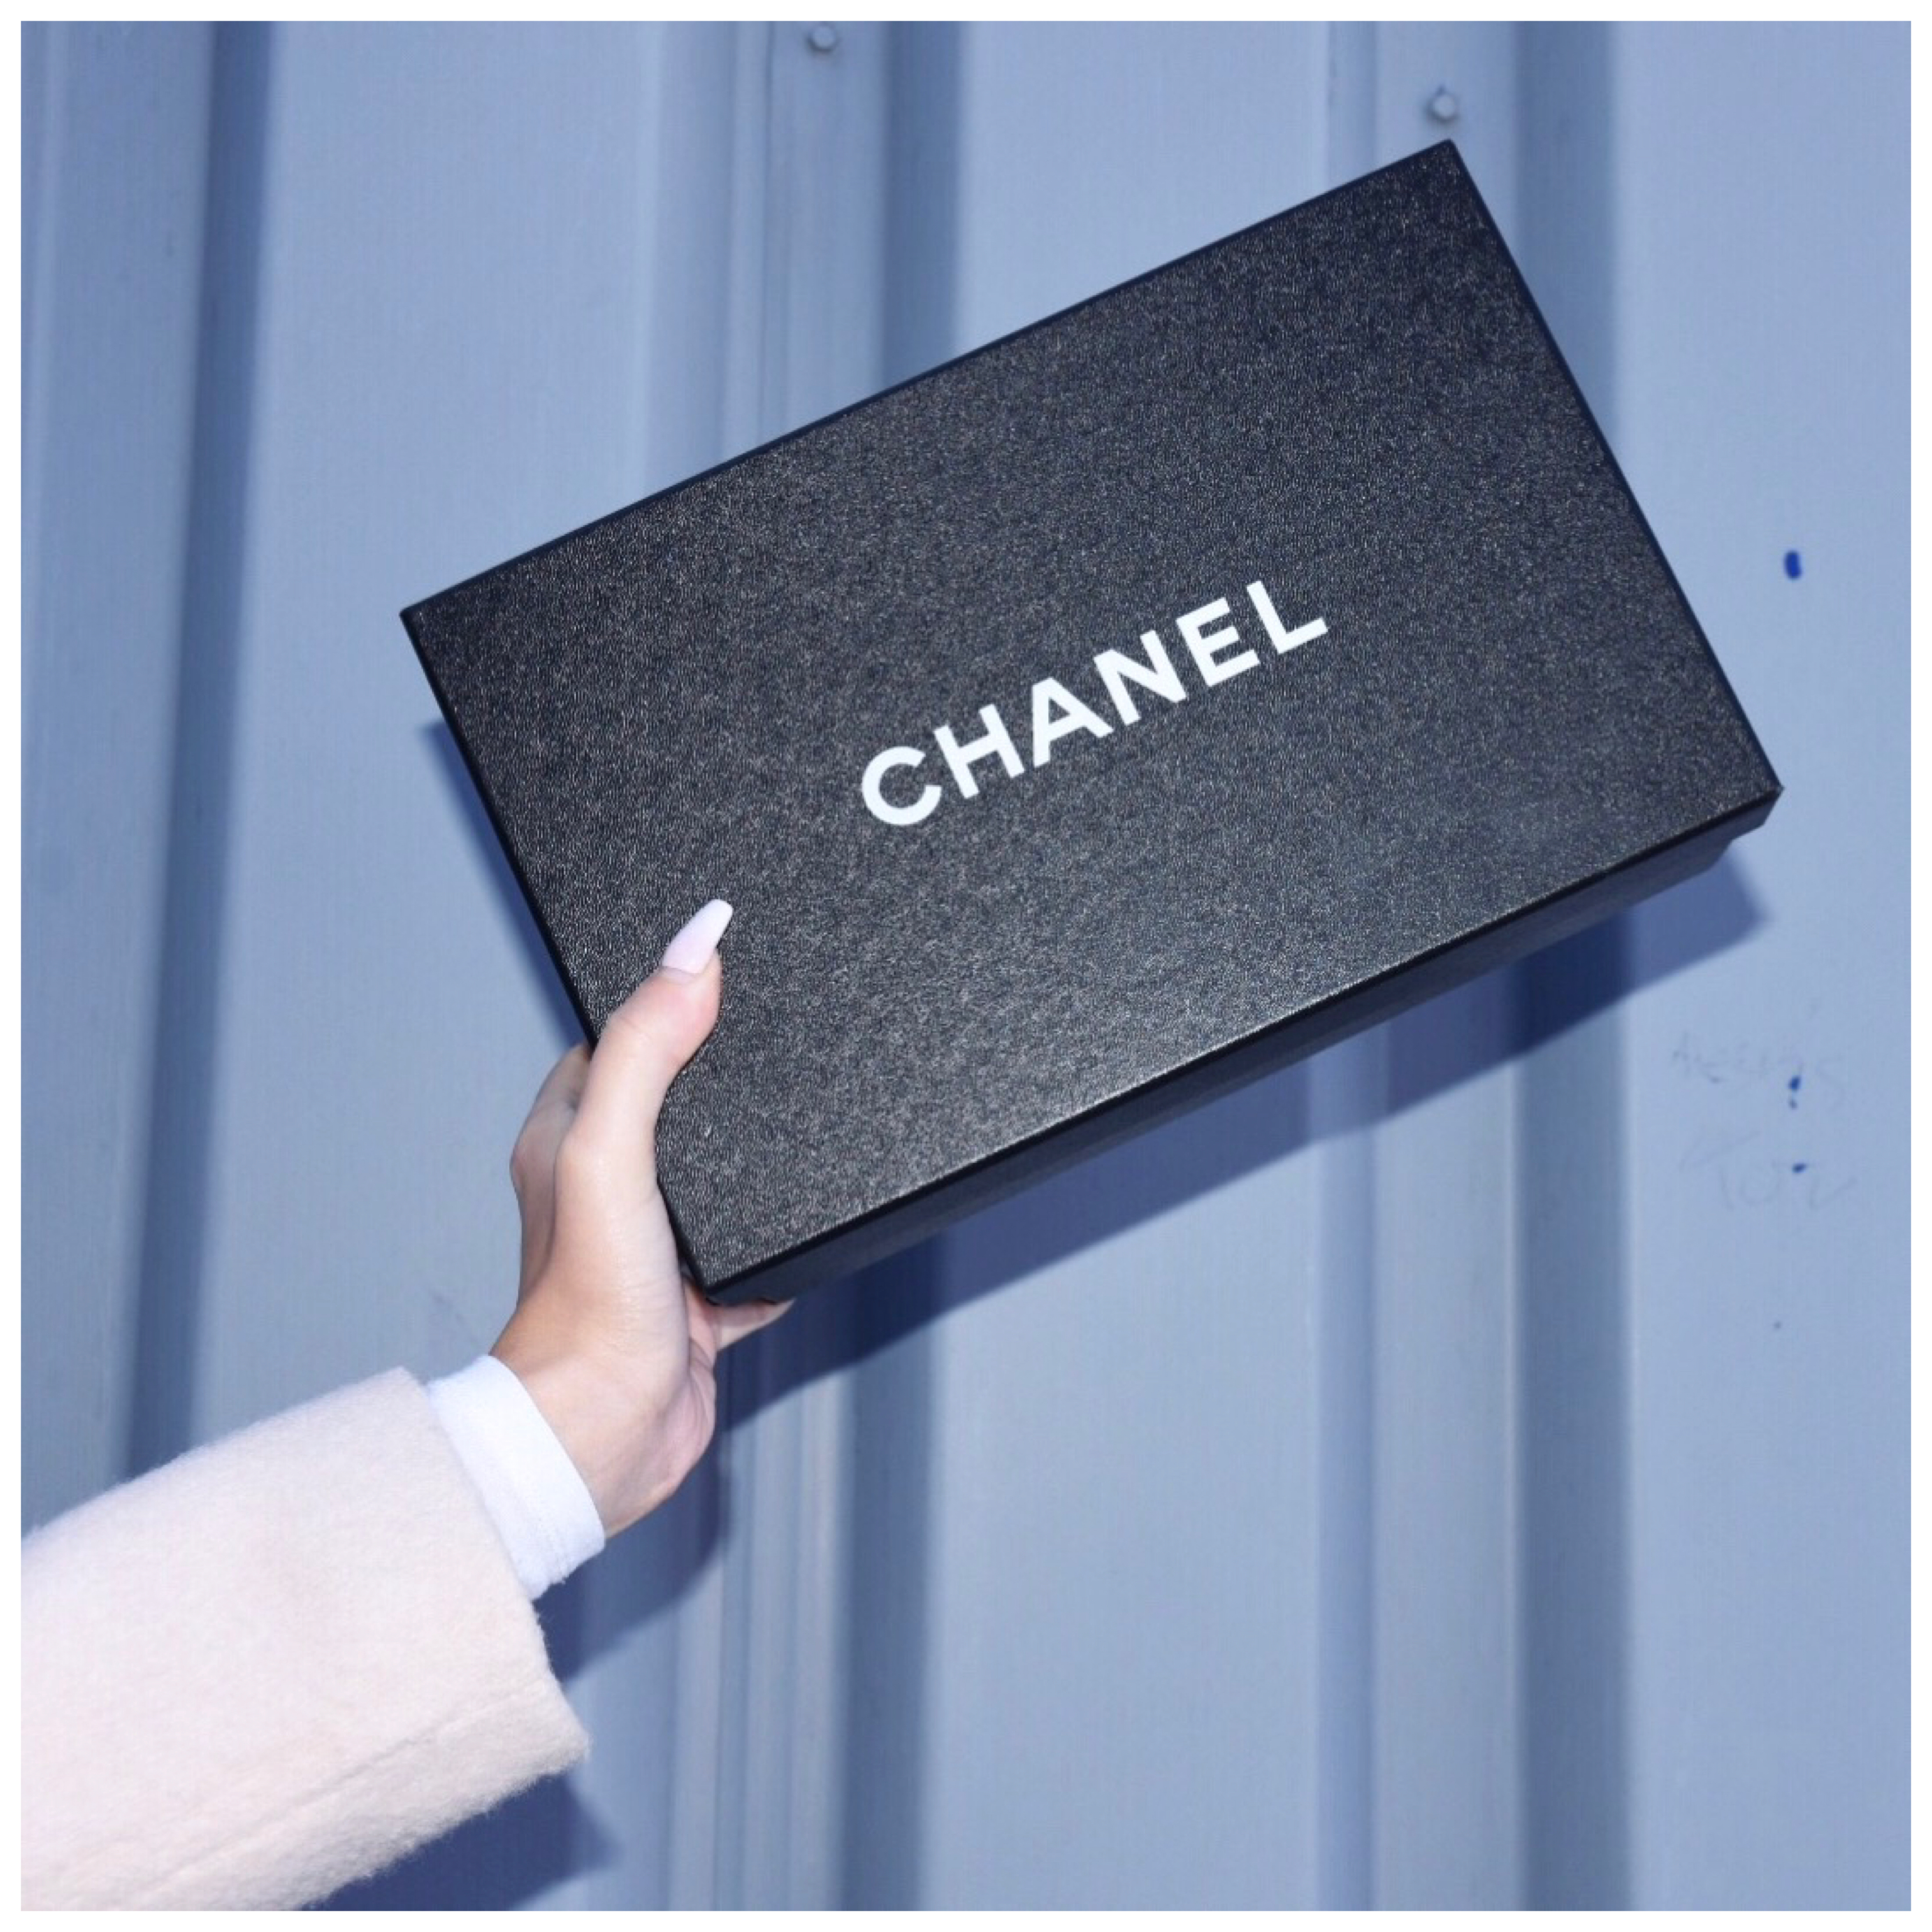 Chanel Sneakers Shoe Size Chart